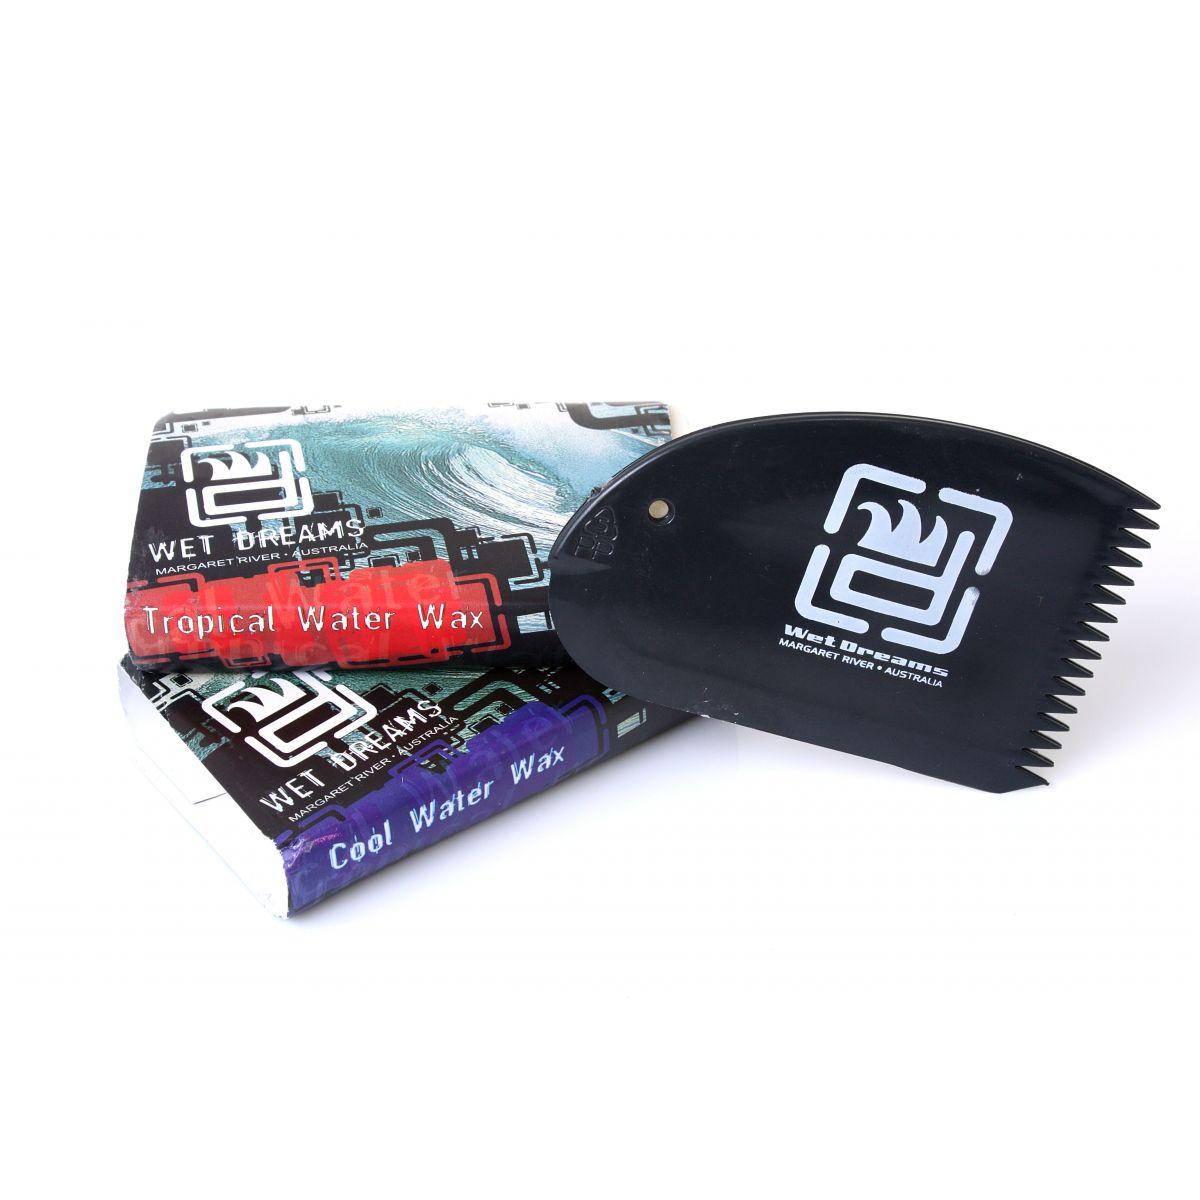 Kit com 5 Parafinas Cool Water Wax + 1 raspador  - Wet Dreams Store